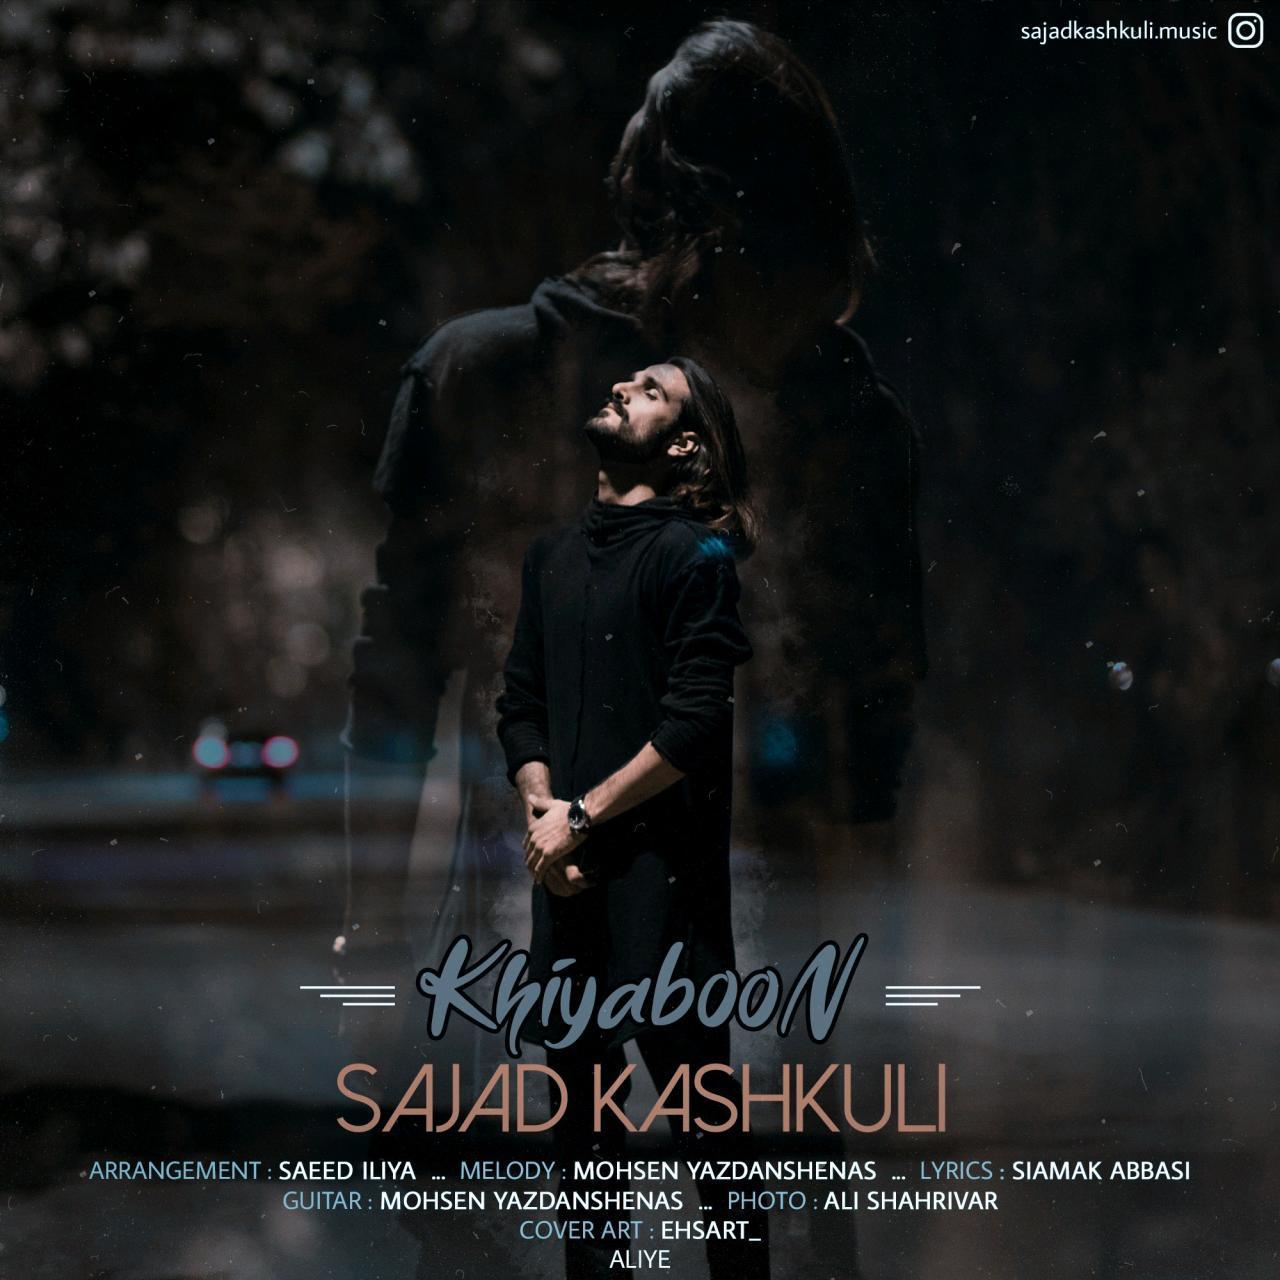 Sajjad Kashkooli – Khiyaboon